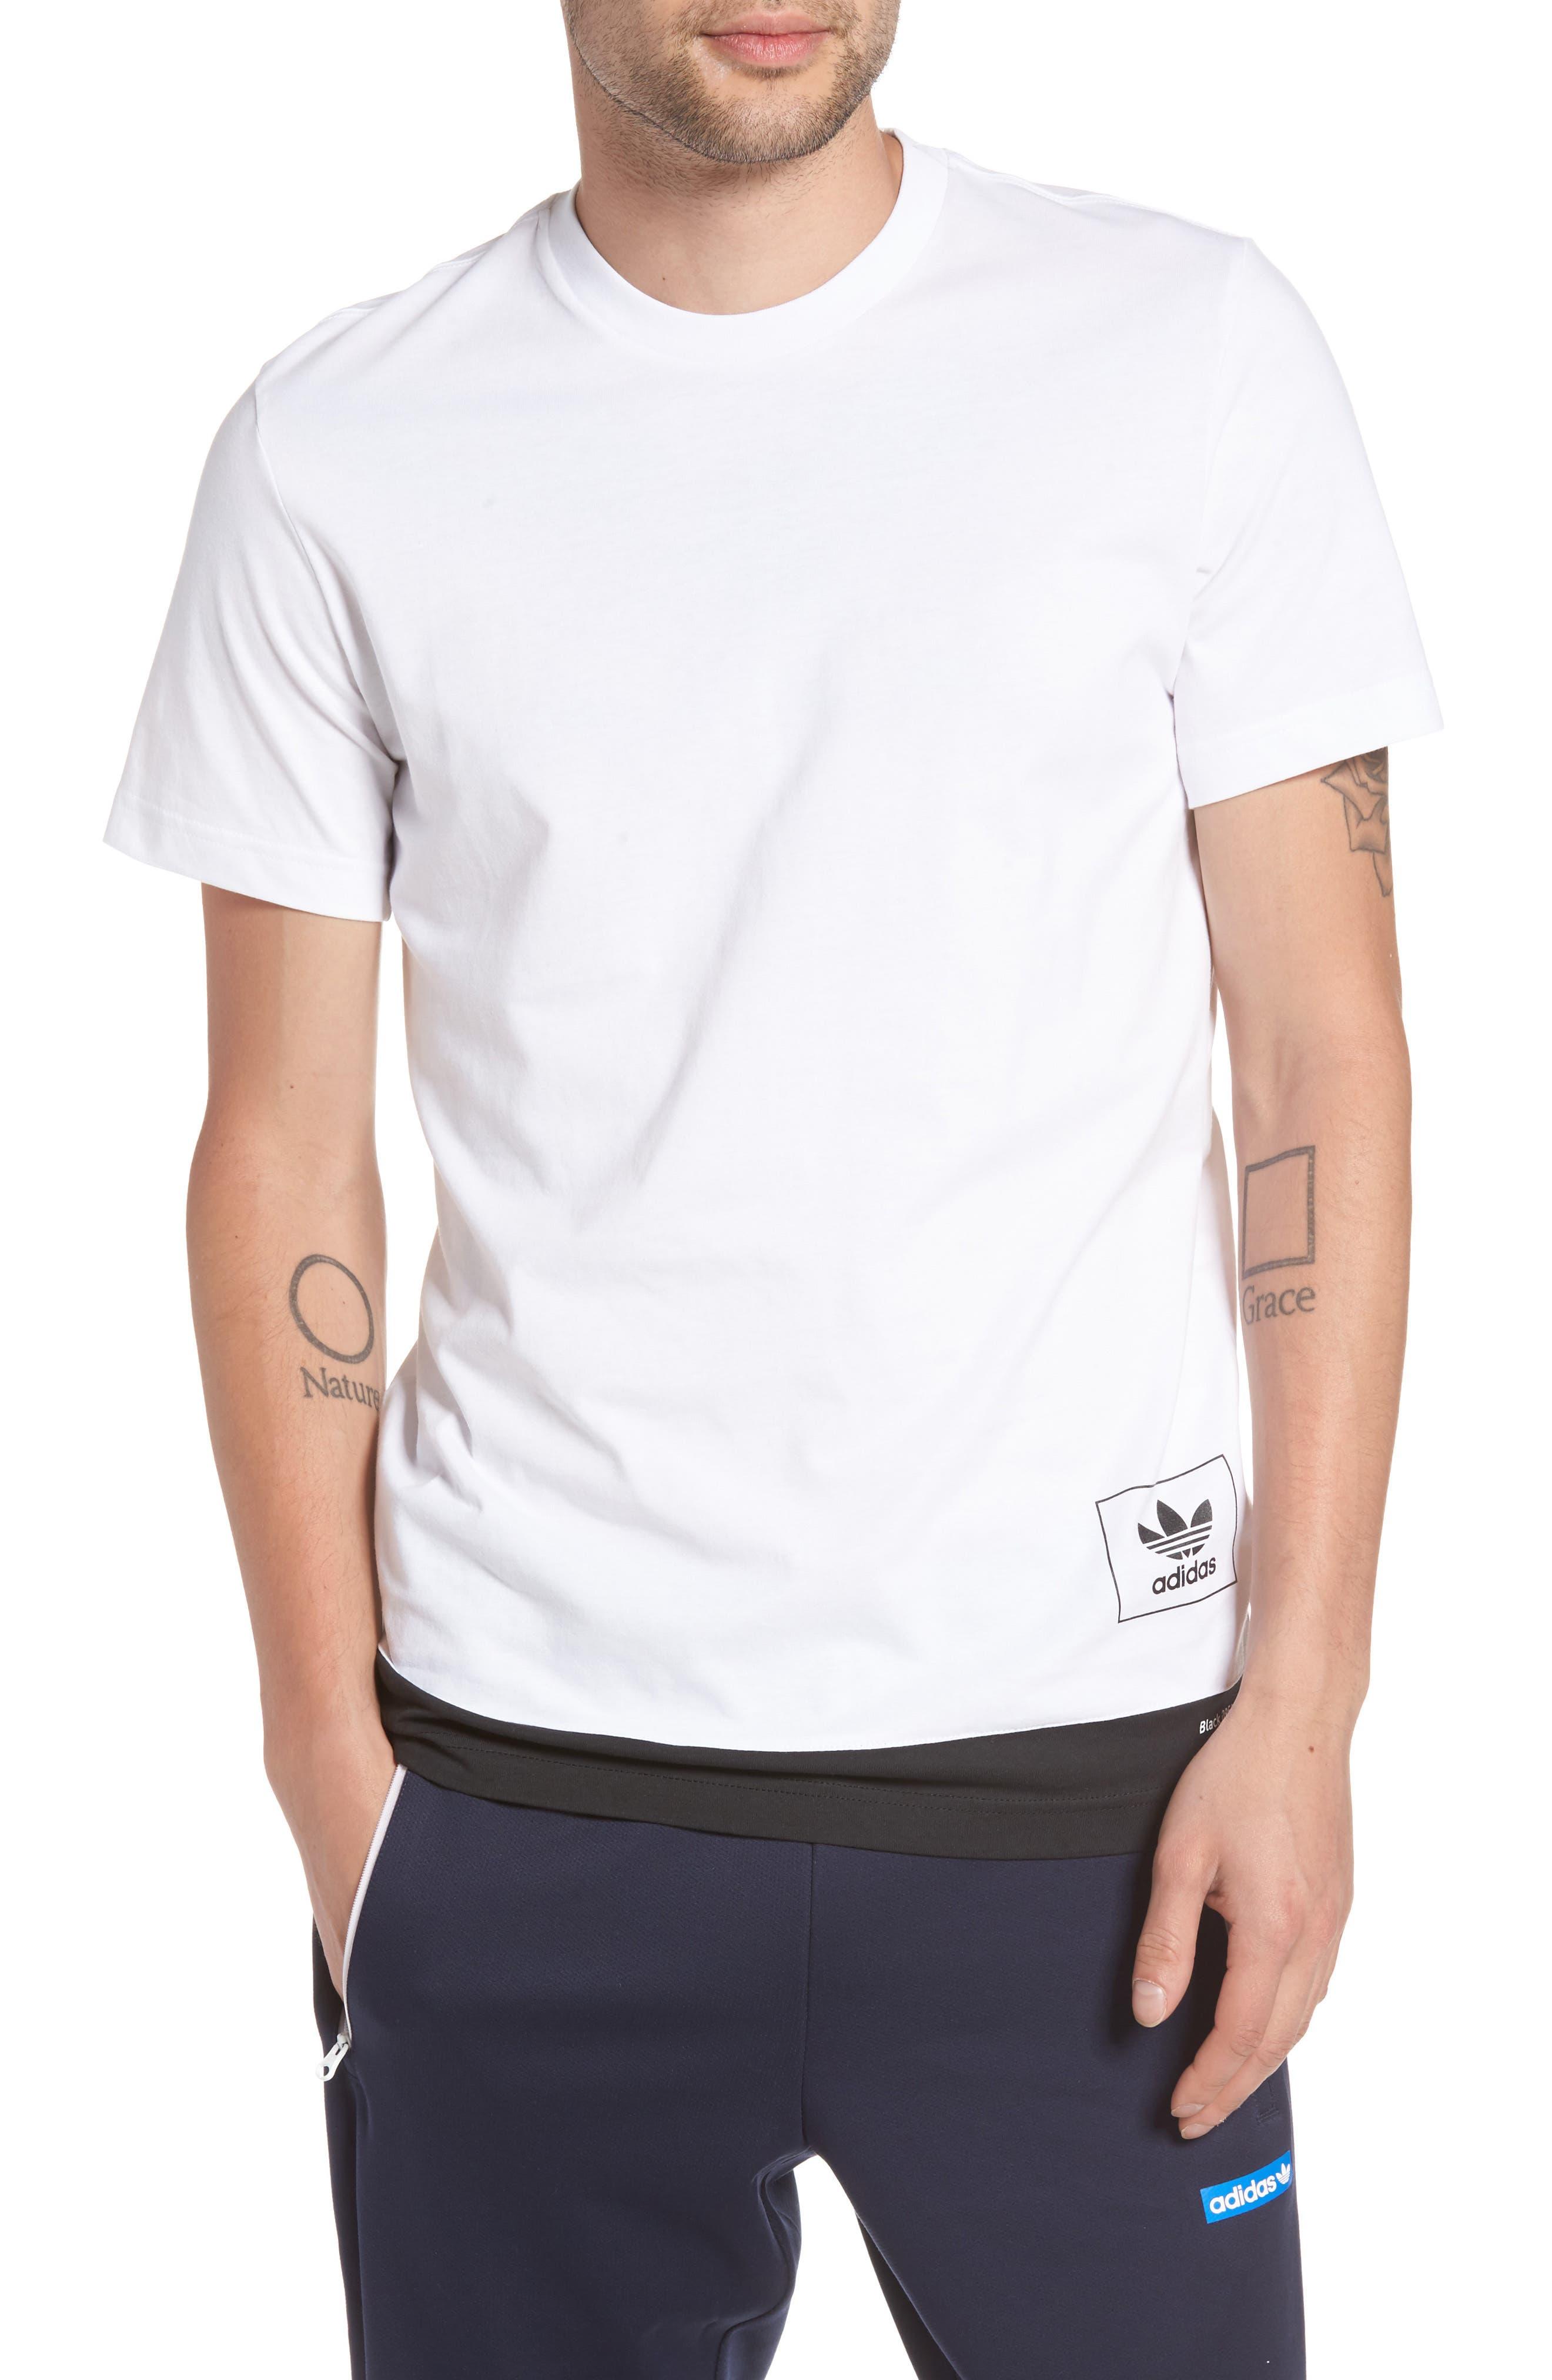 adidas Originals Footwear Link T-Shirt